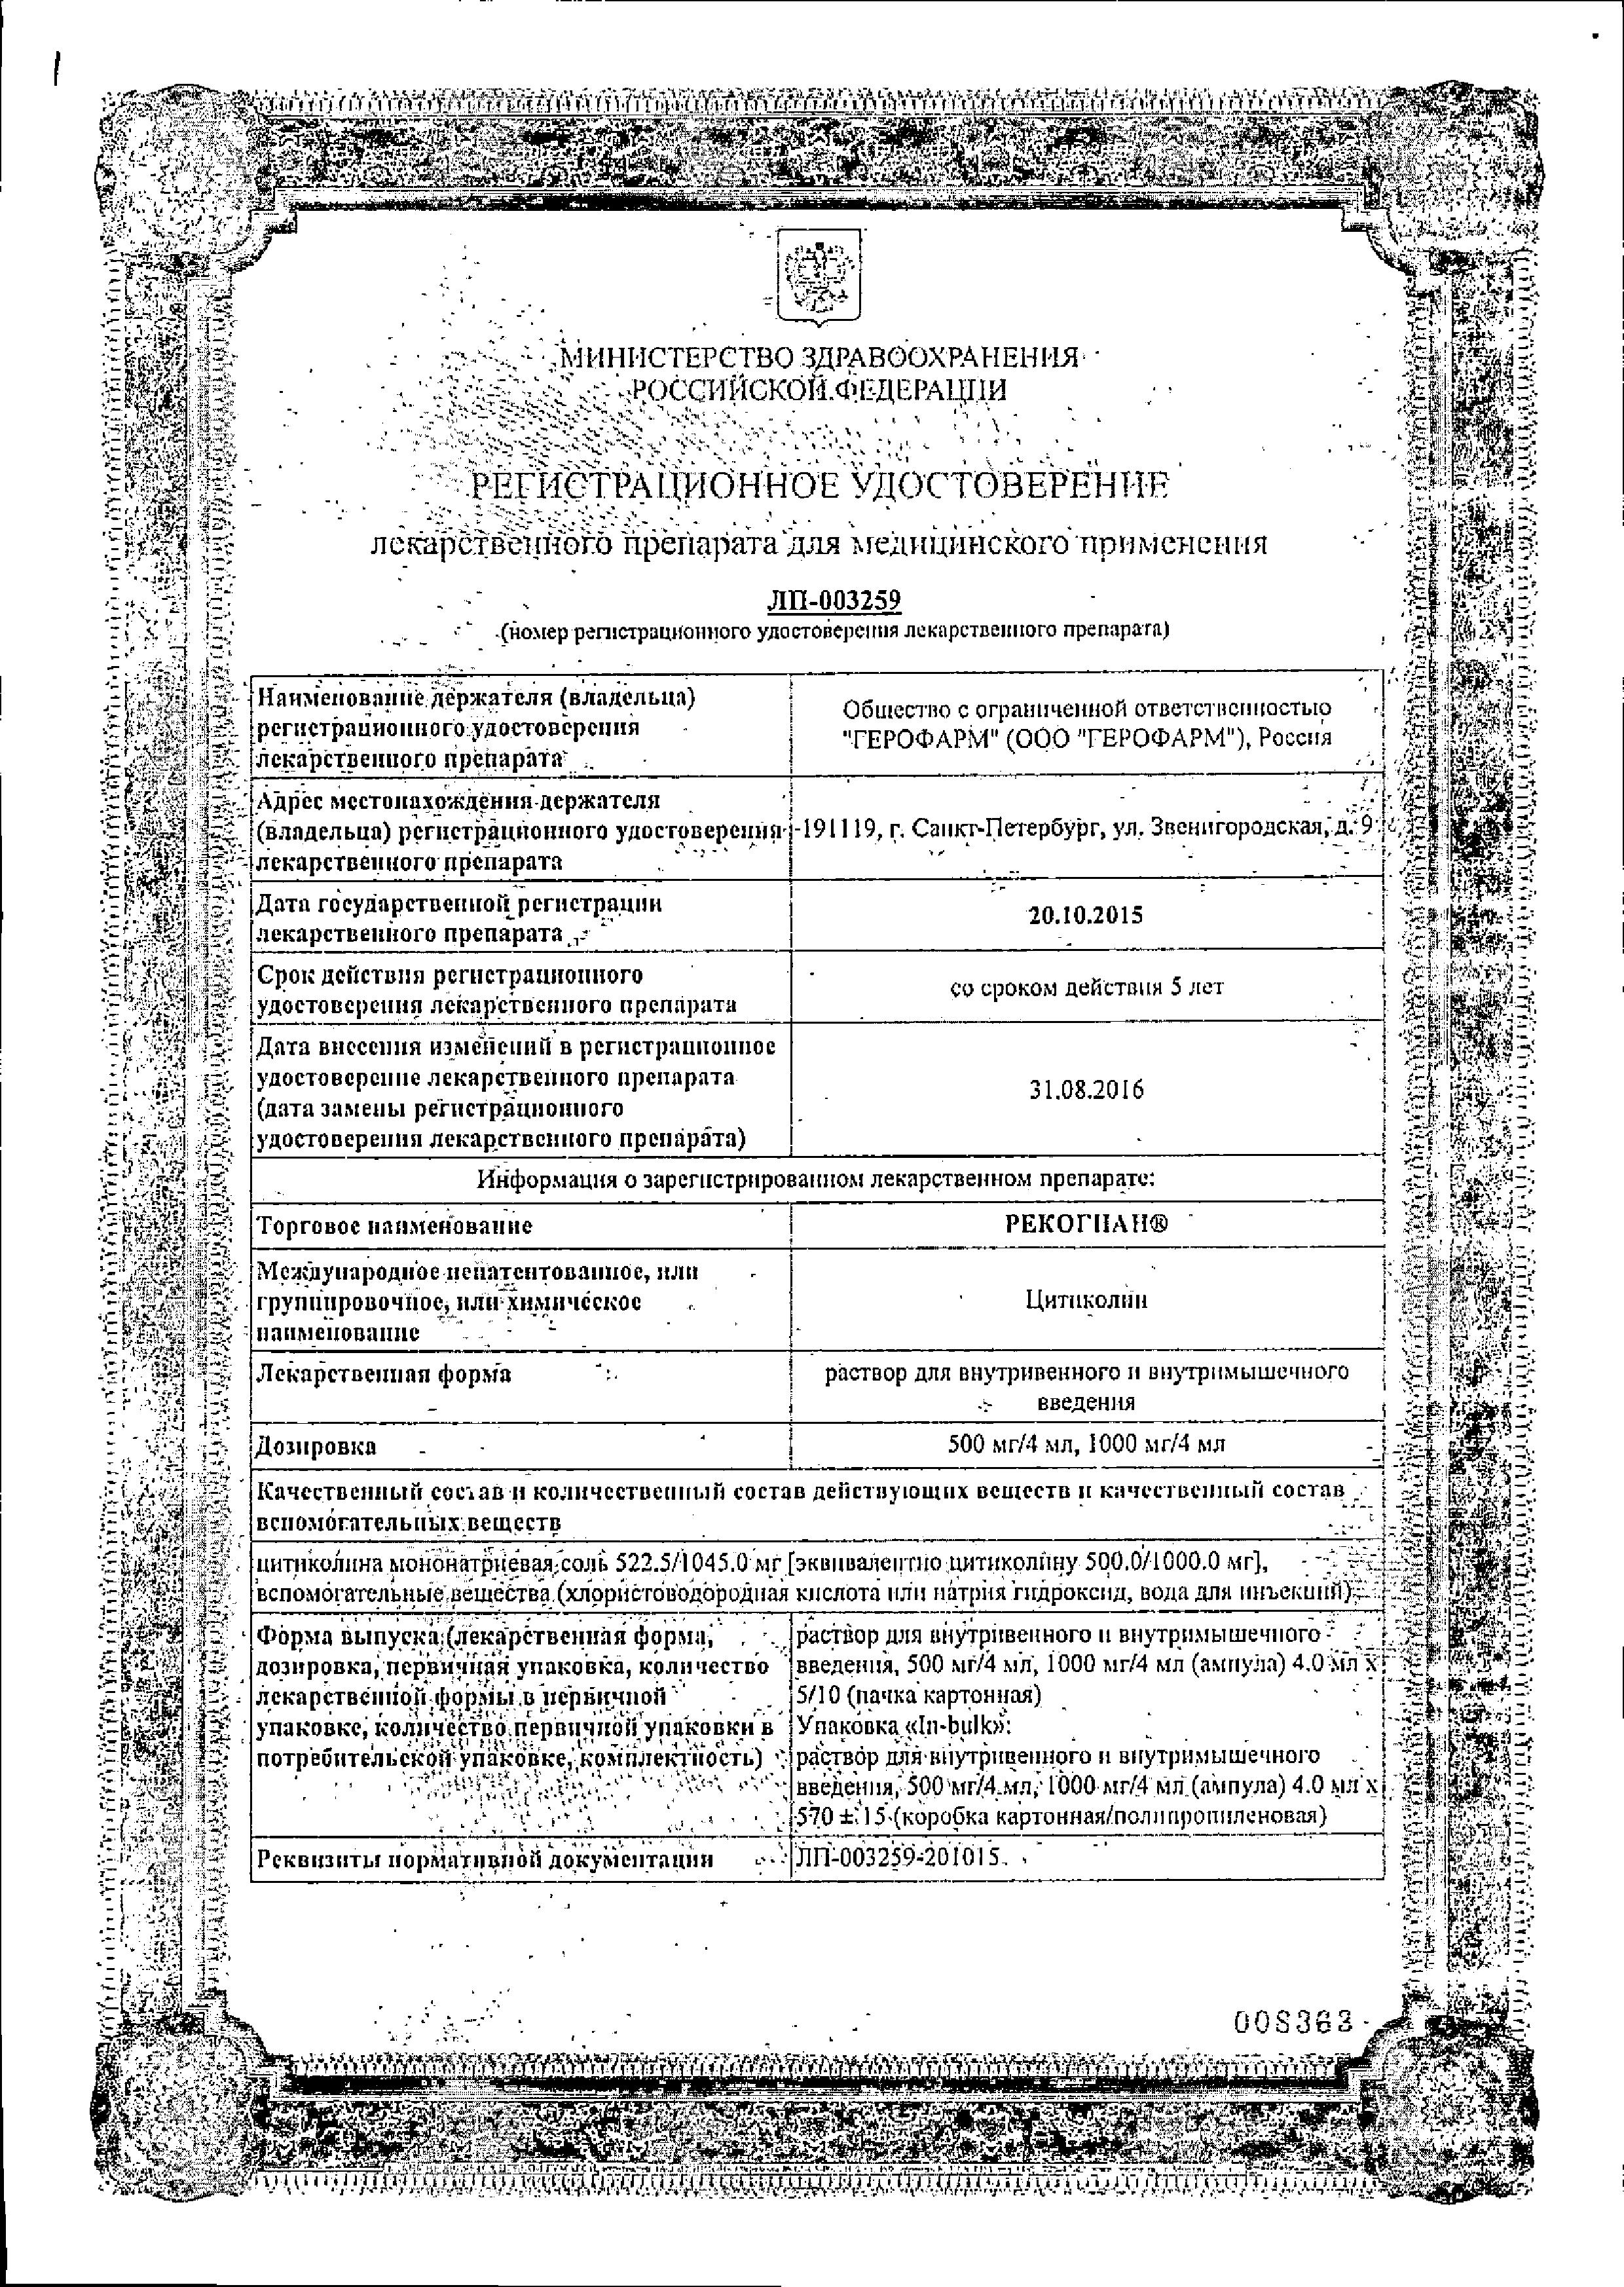 Рекогнан сертификат